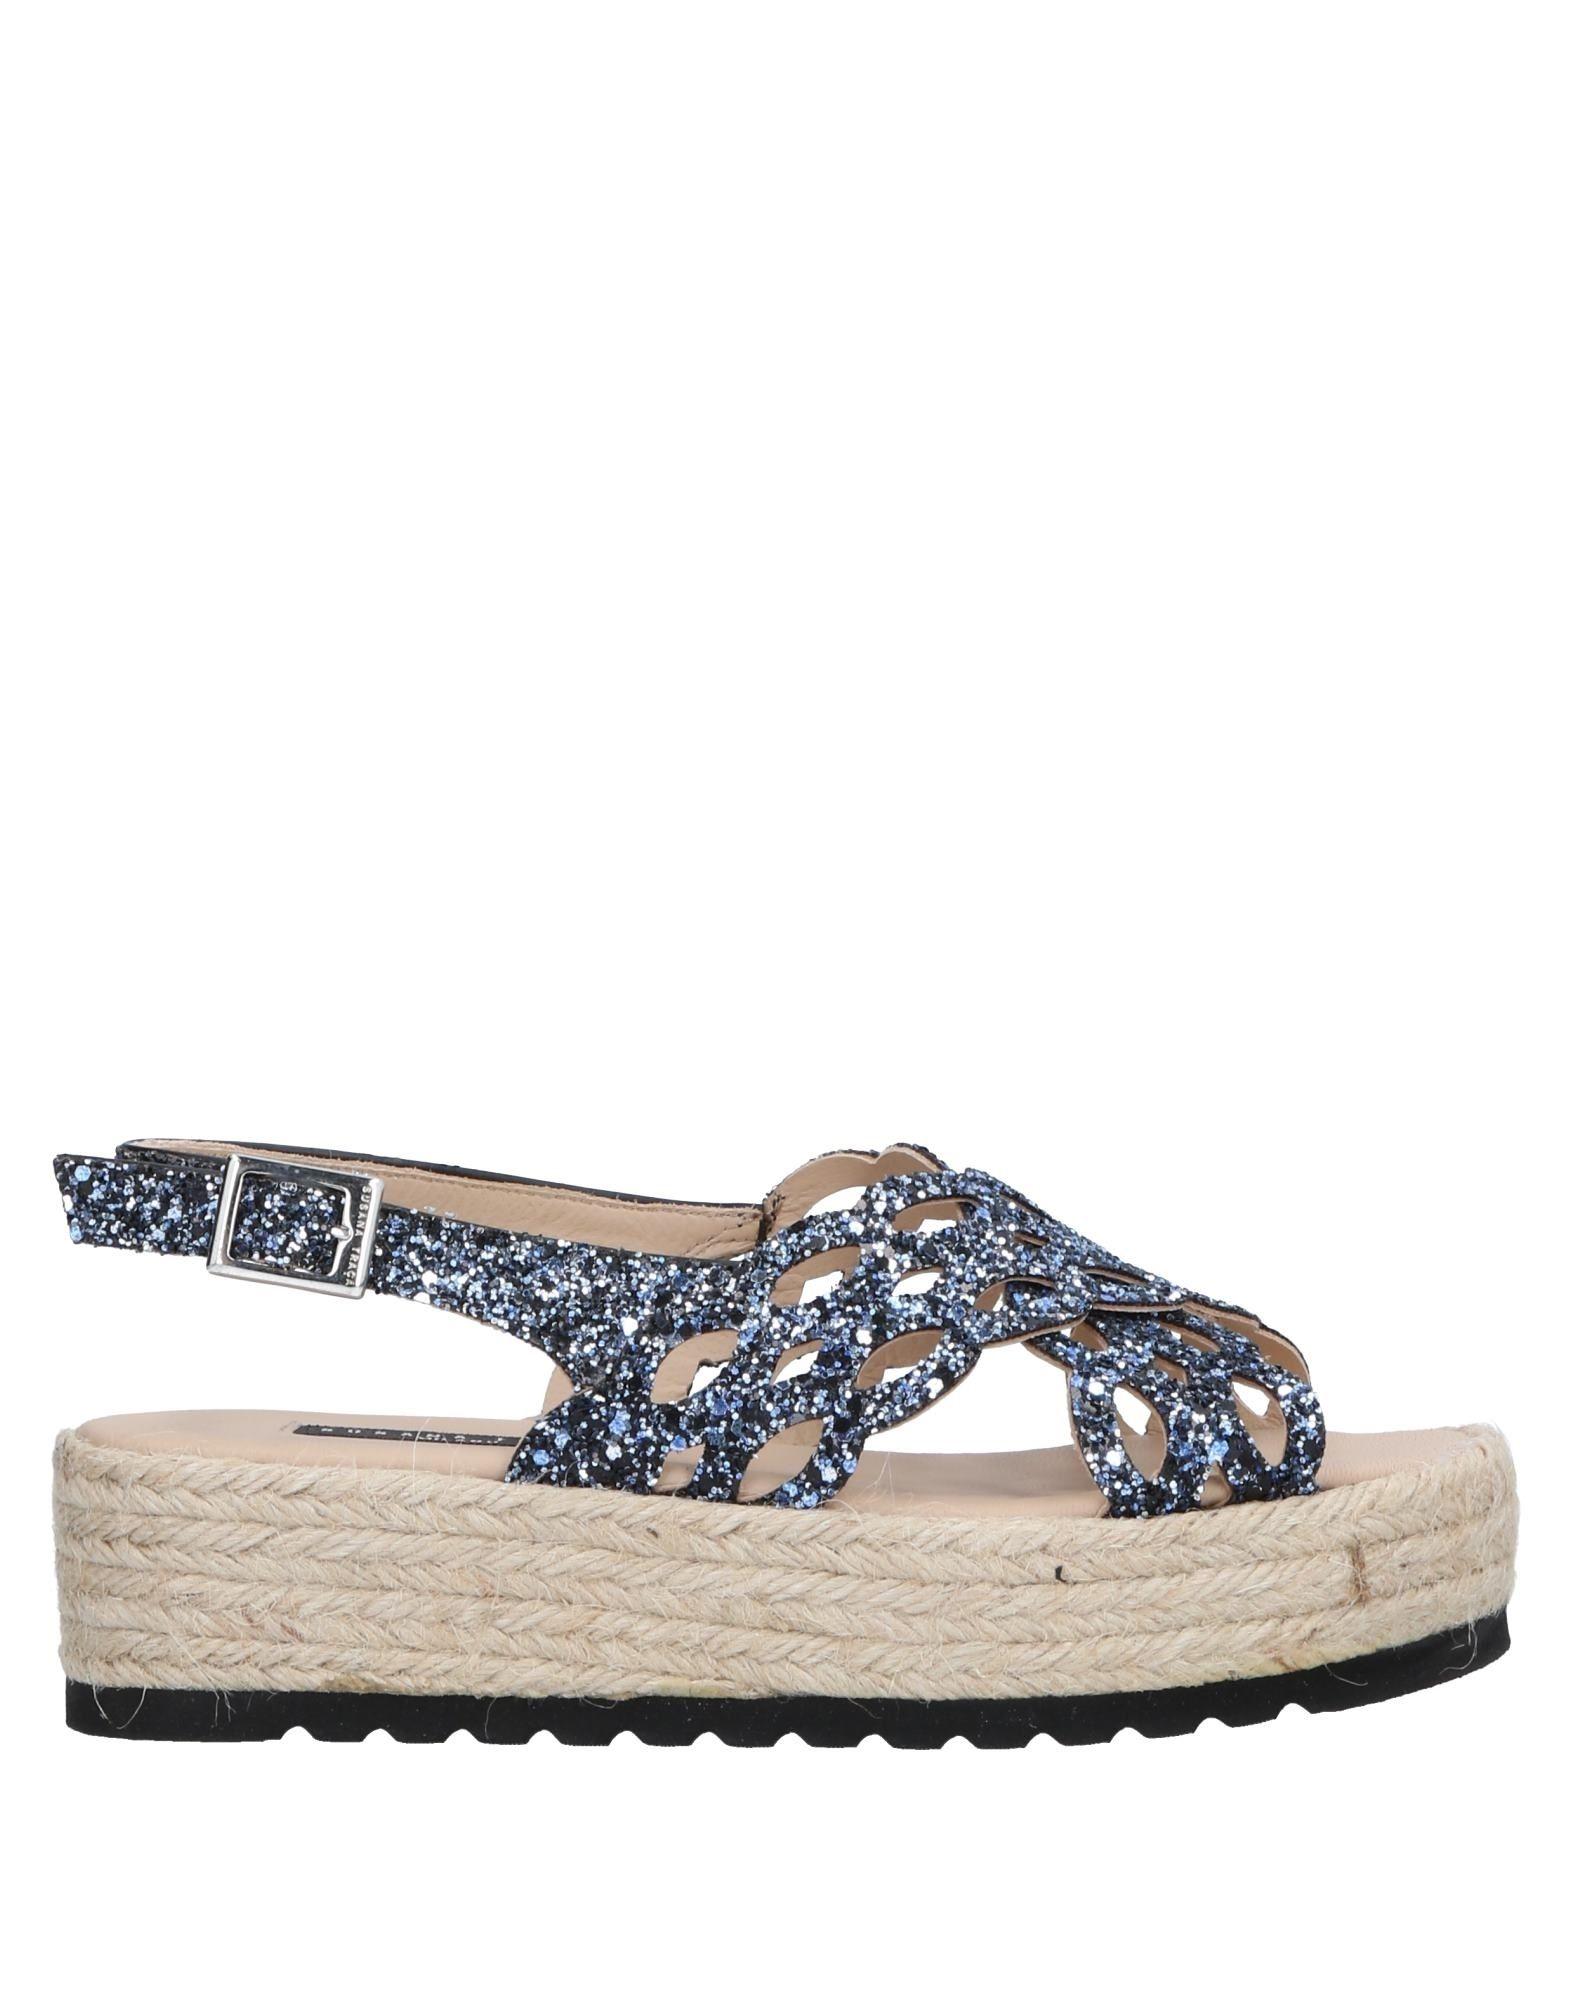 Gut um billige Damen Schuhe zu tragenSusana Traca Espadrilles Damen billige  11215223WN f6d048